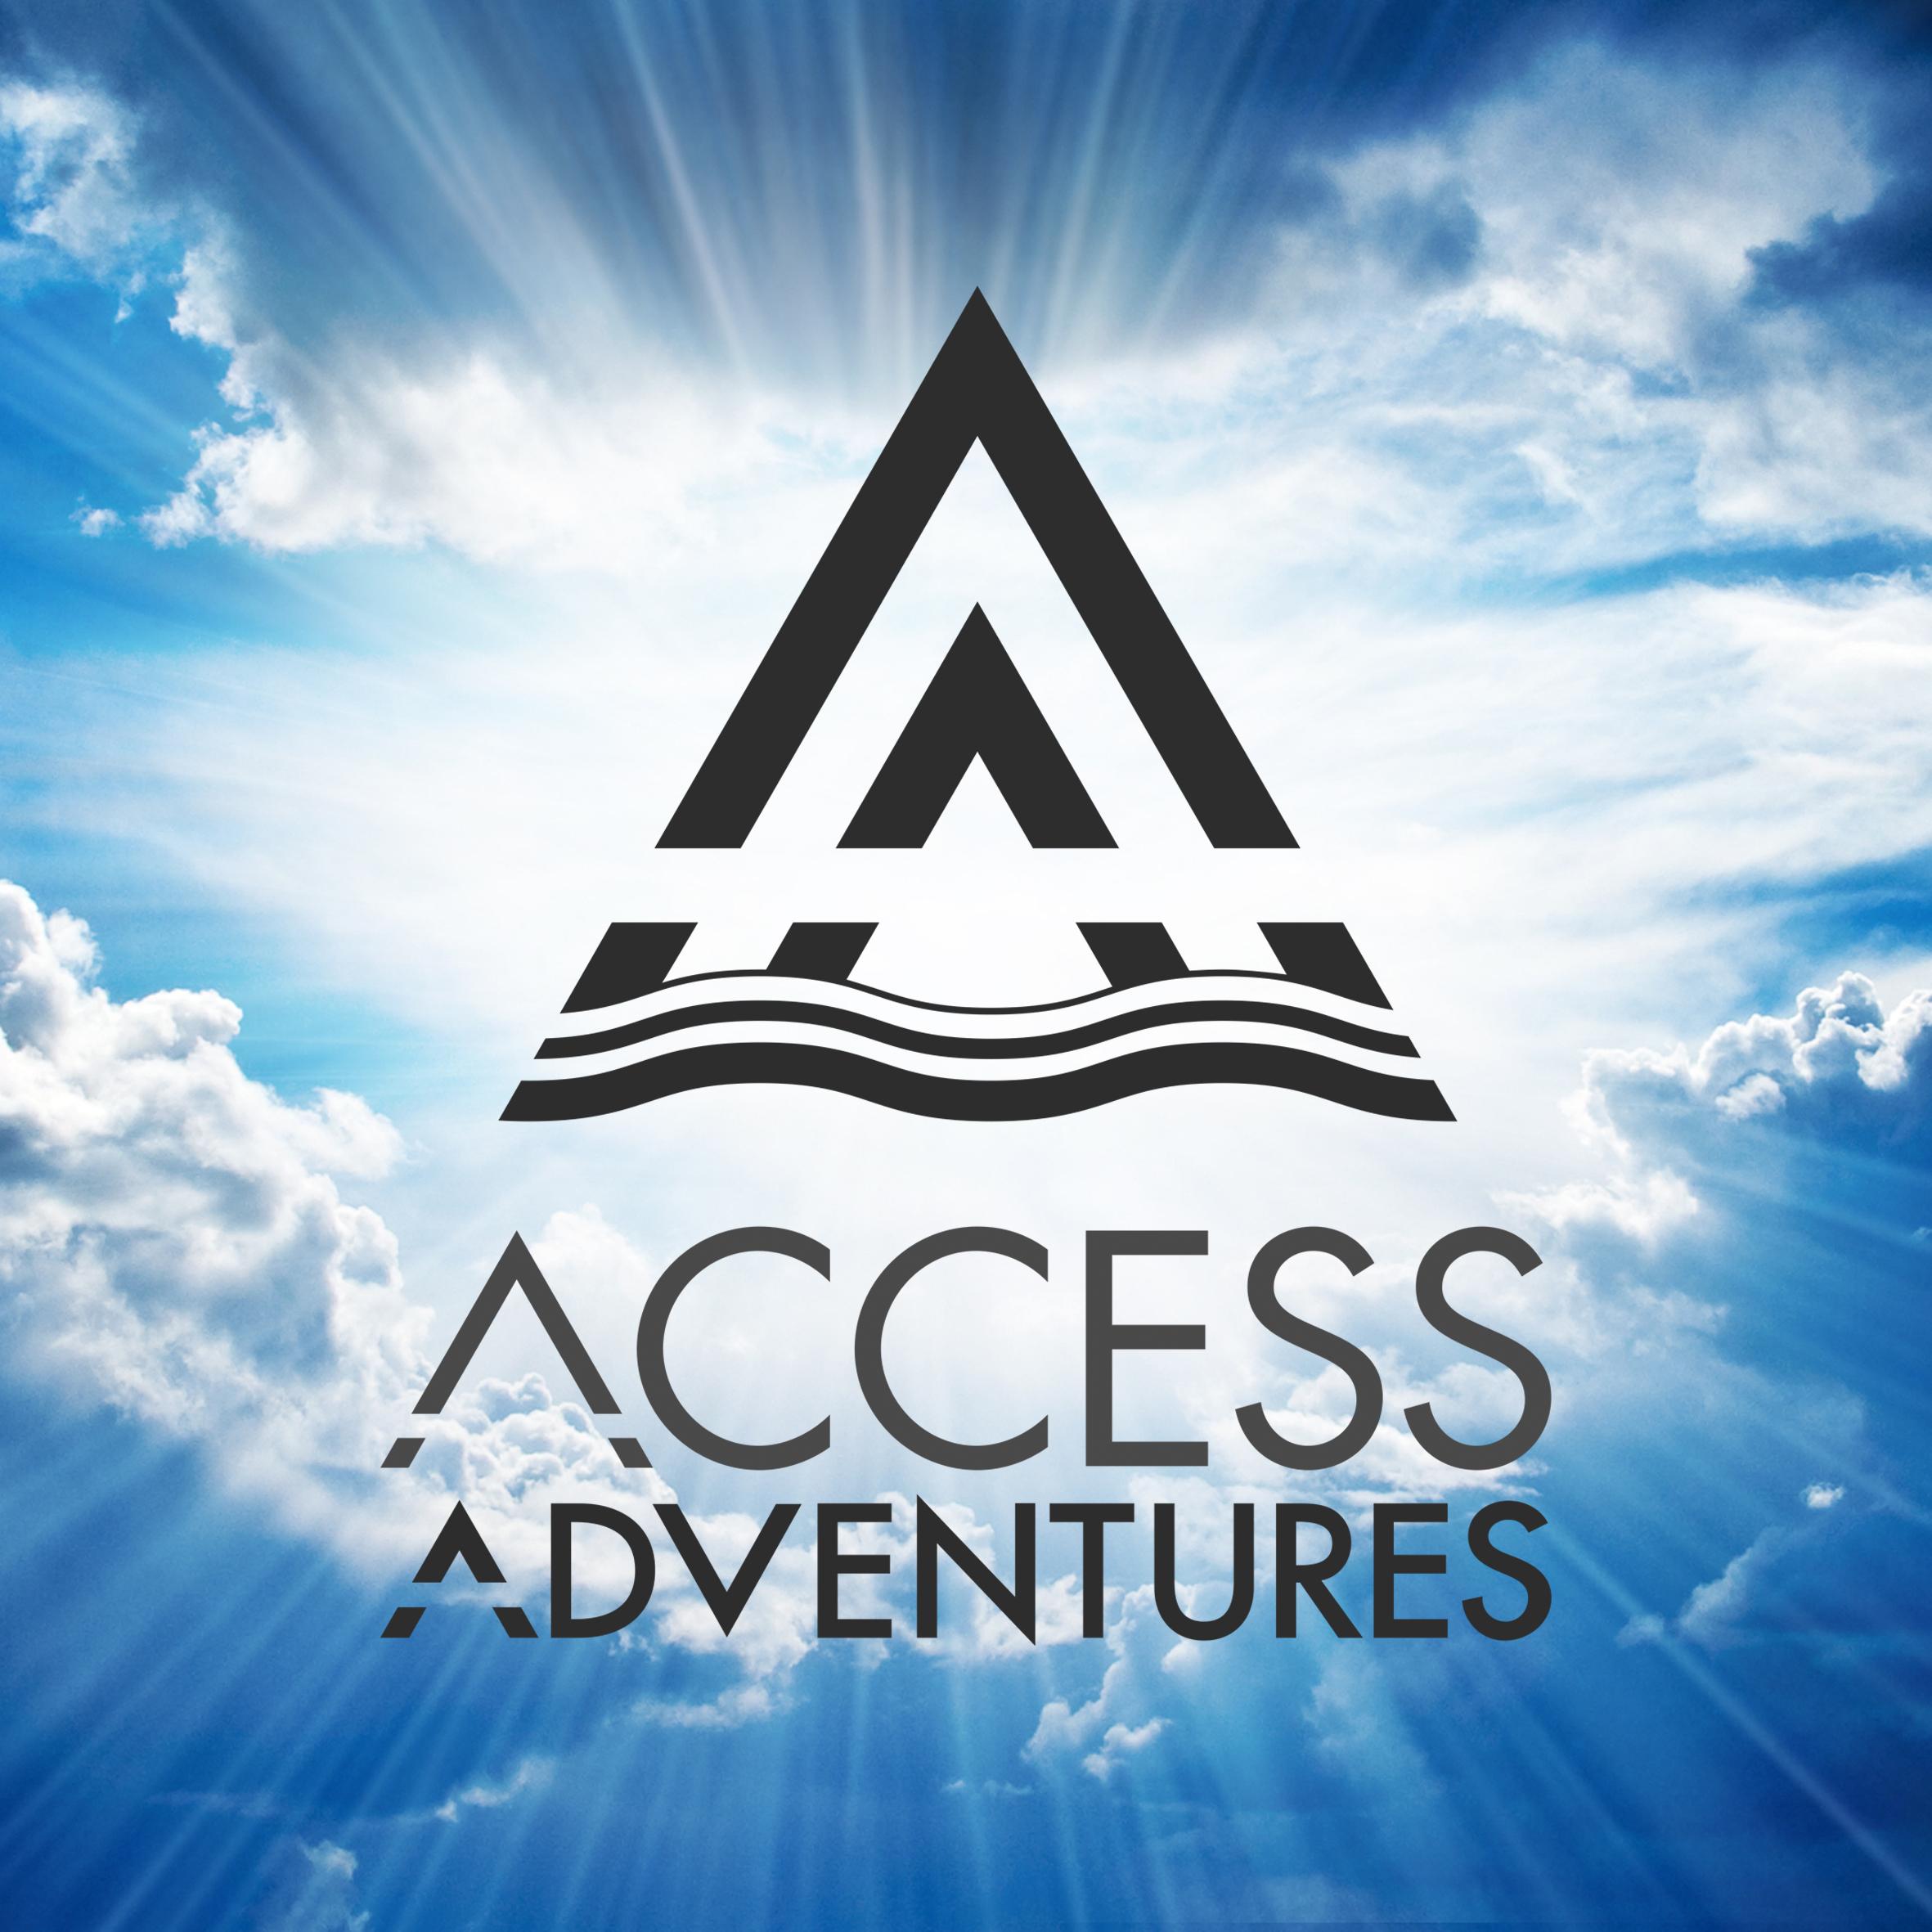 Copy of Access Adventures, Superheroseries.co.uk